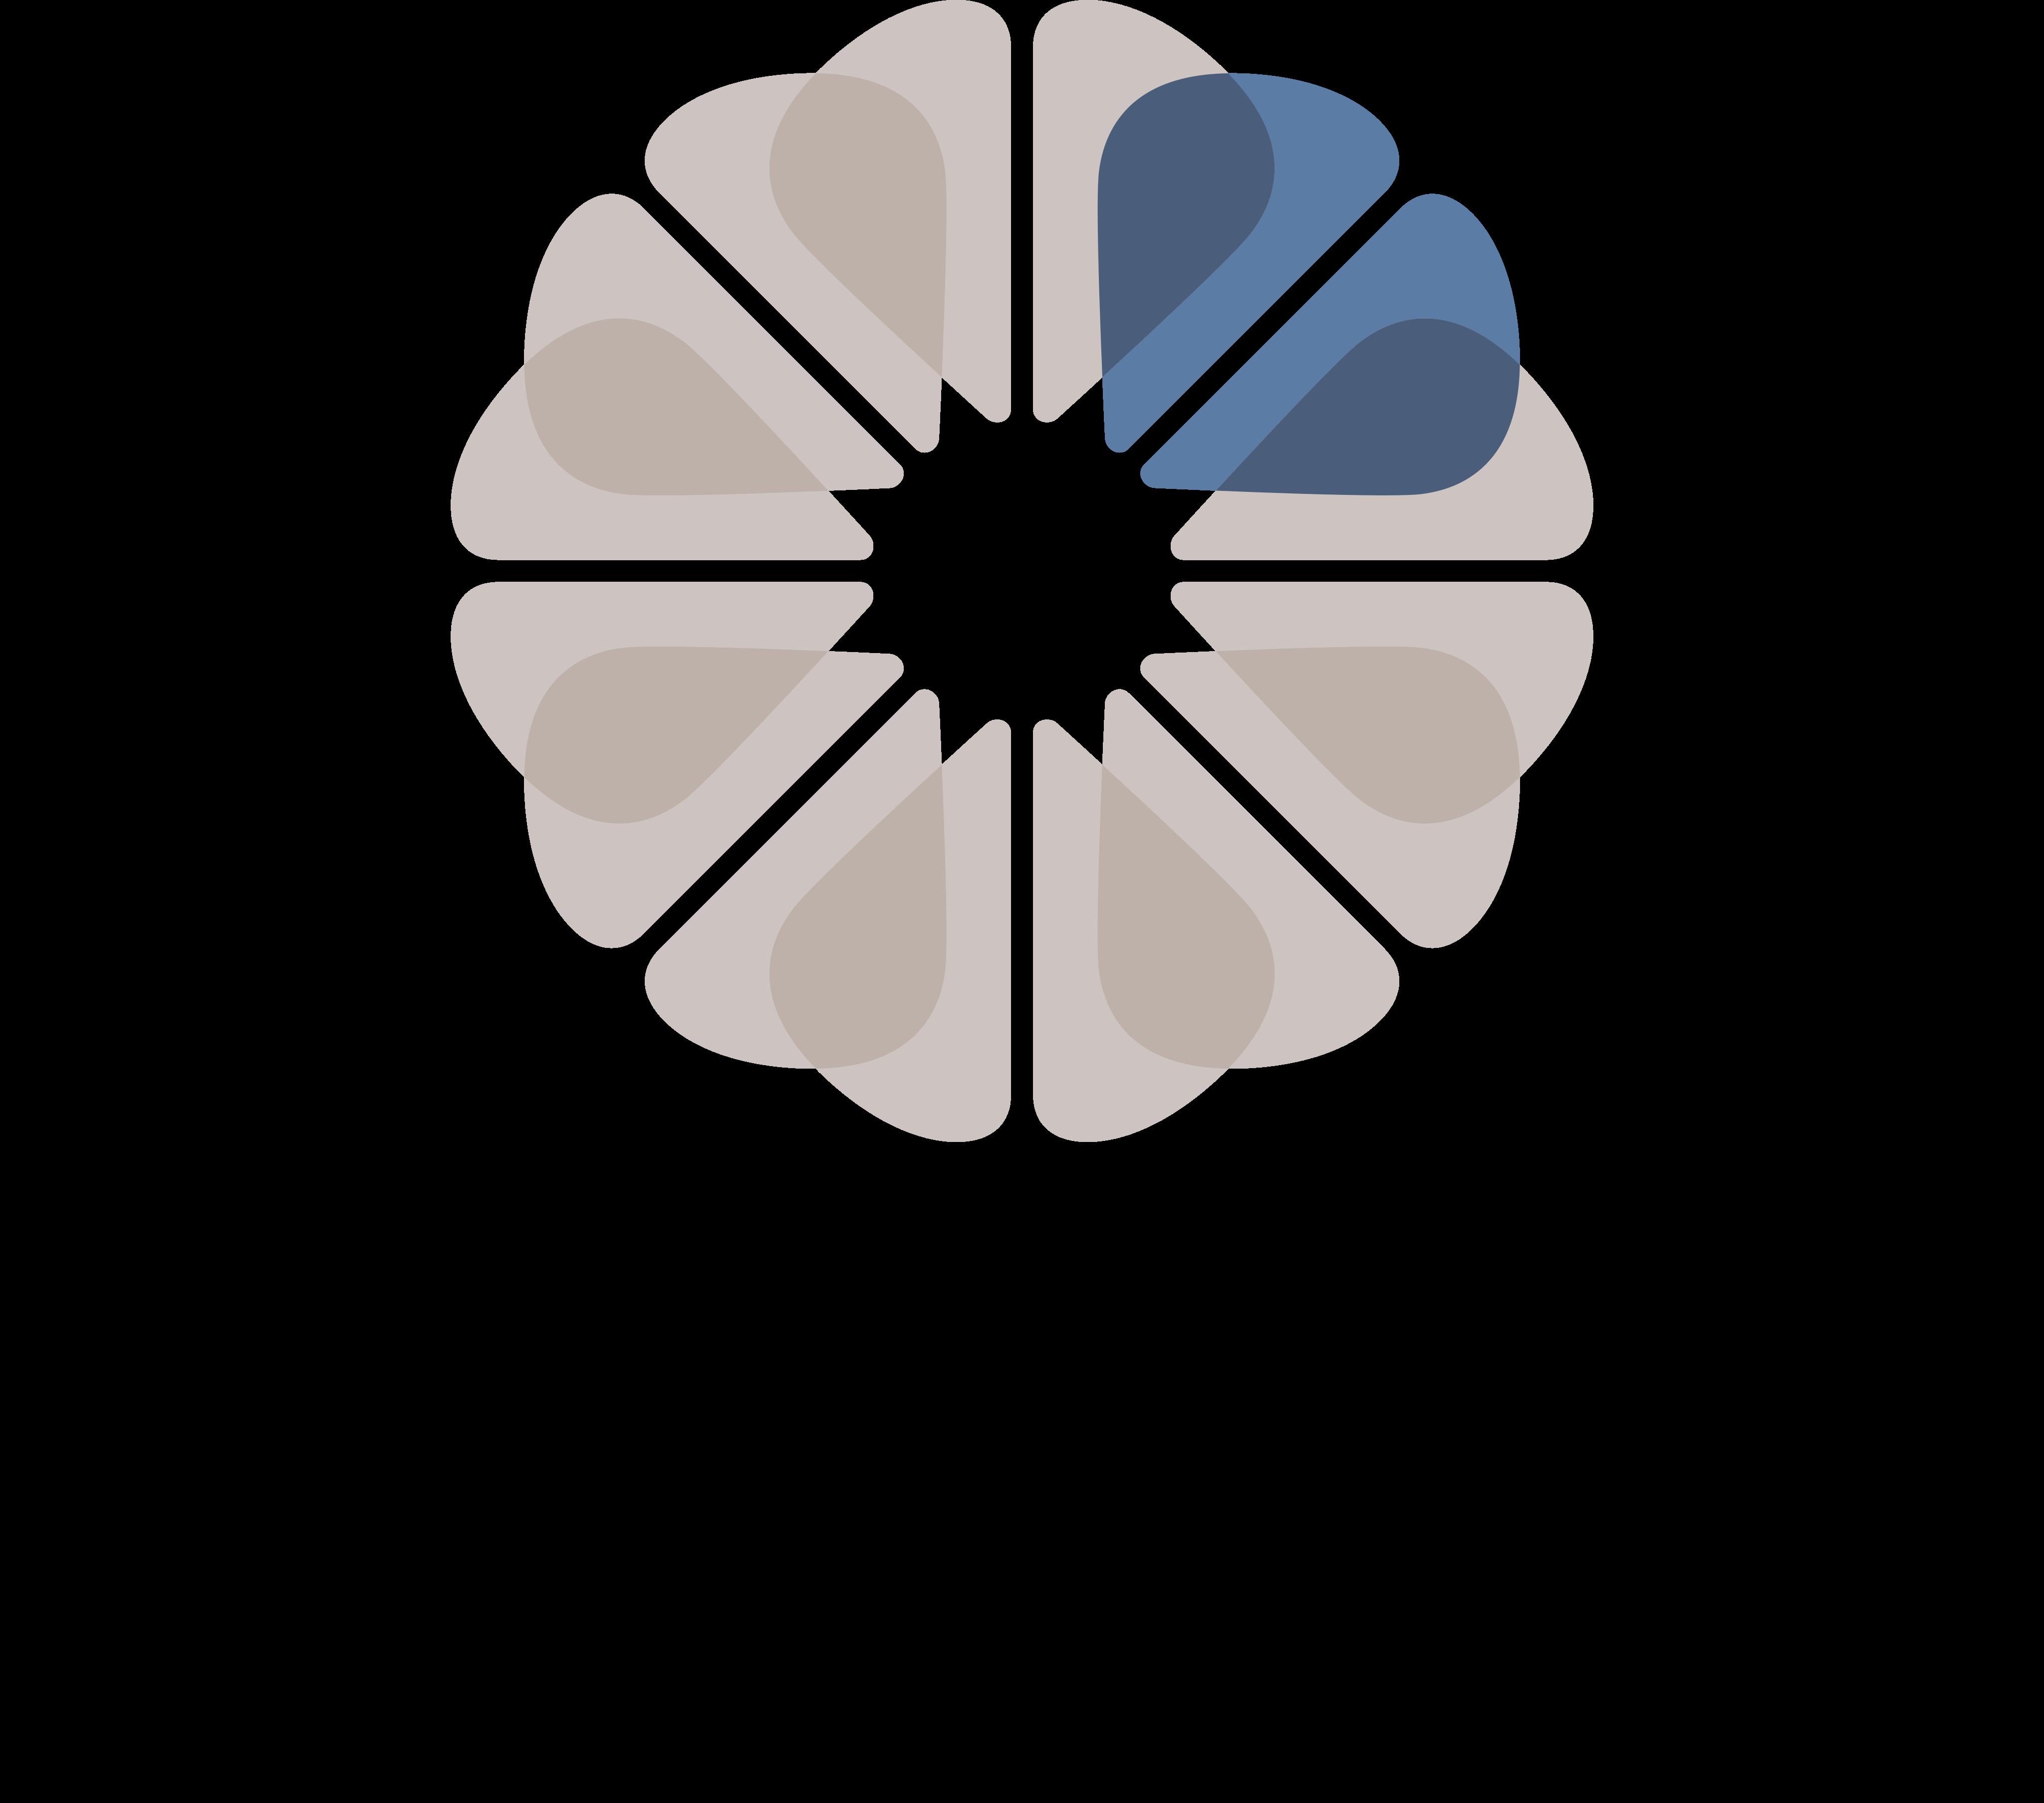 clear corretora logo 3 - Clear Corretora Logo